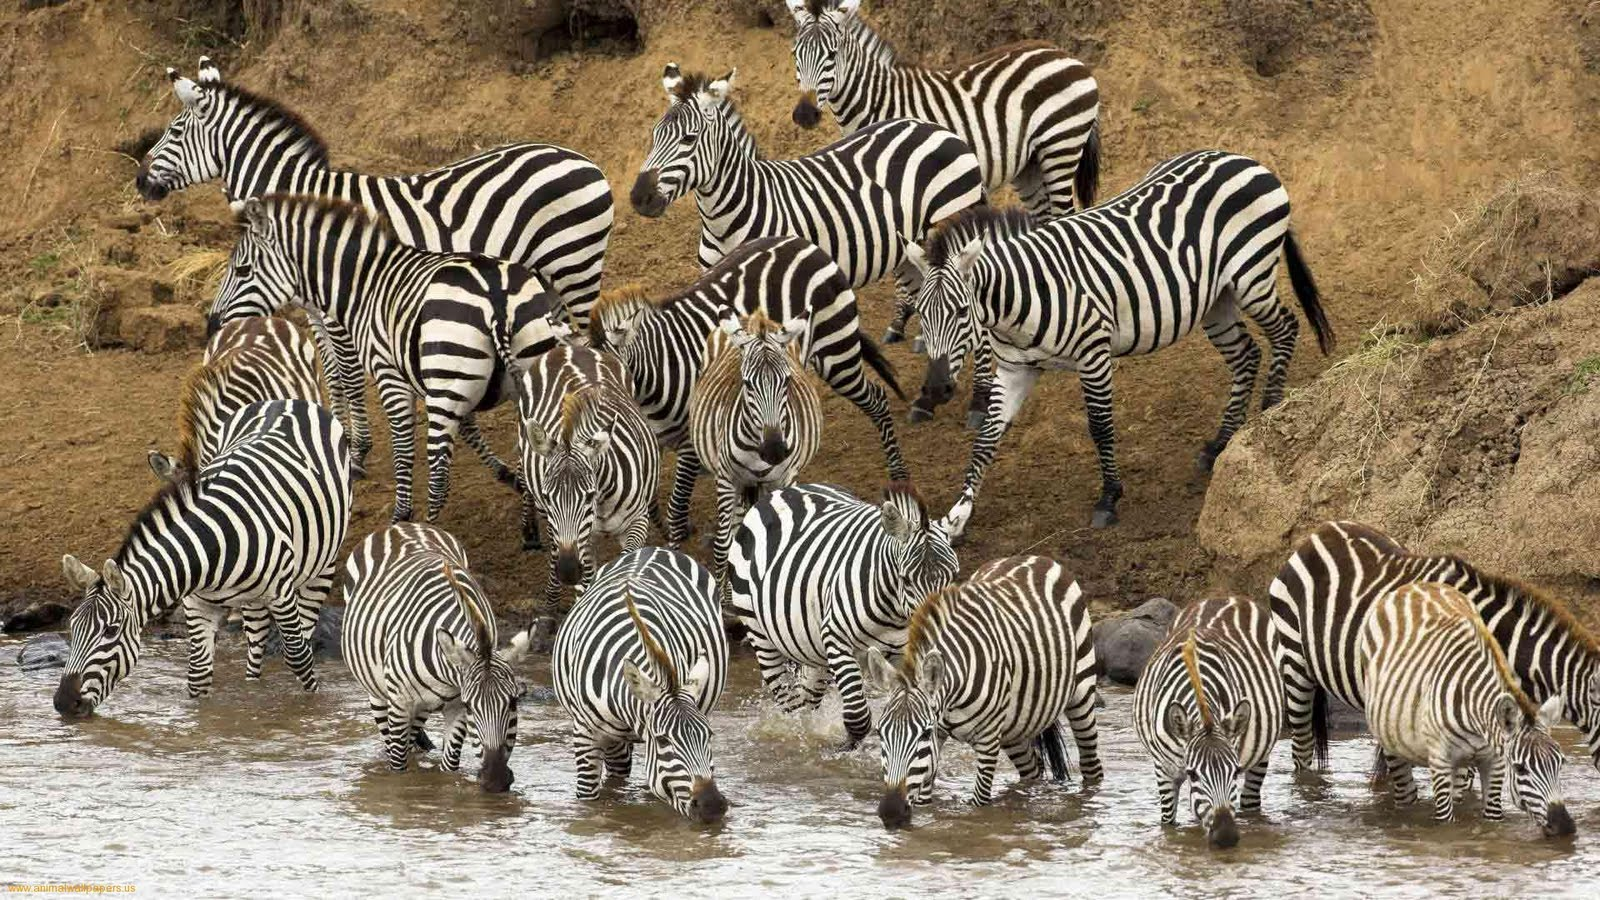 Images of wild animals